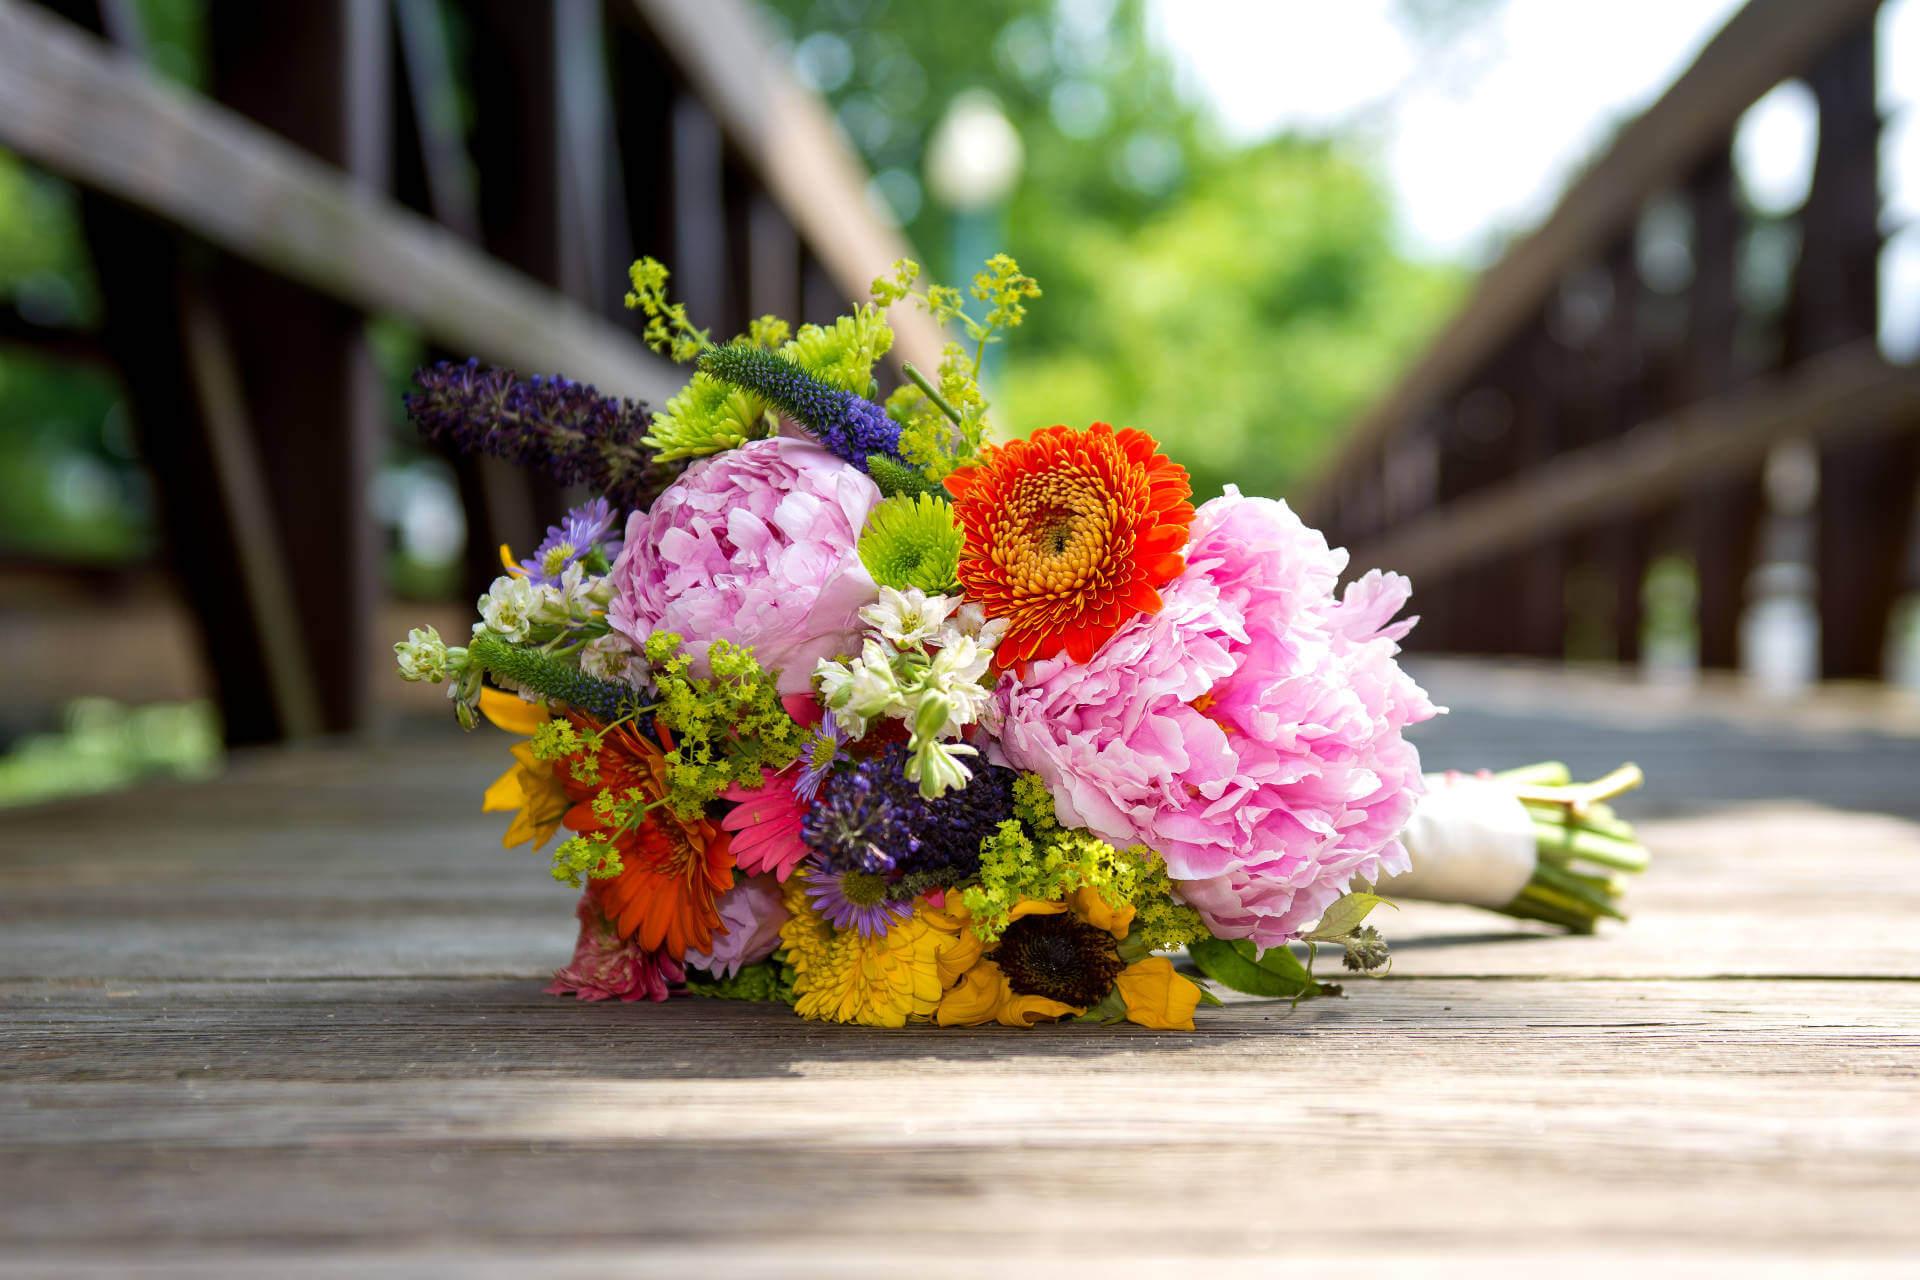 Wedding Flowers Bouquet   Kropp Photography - Wedding Photography Portfolio